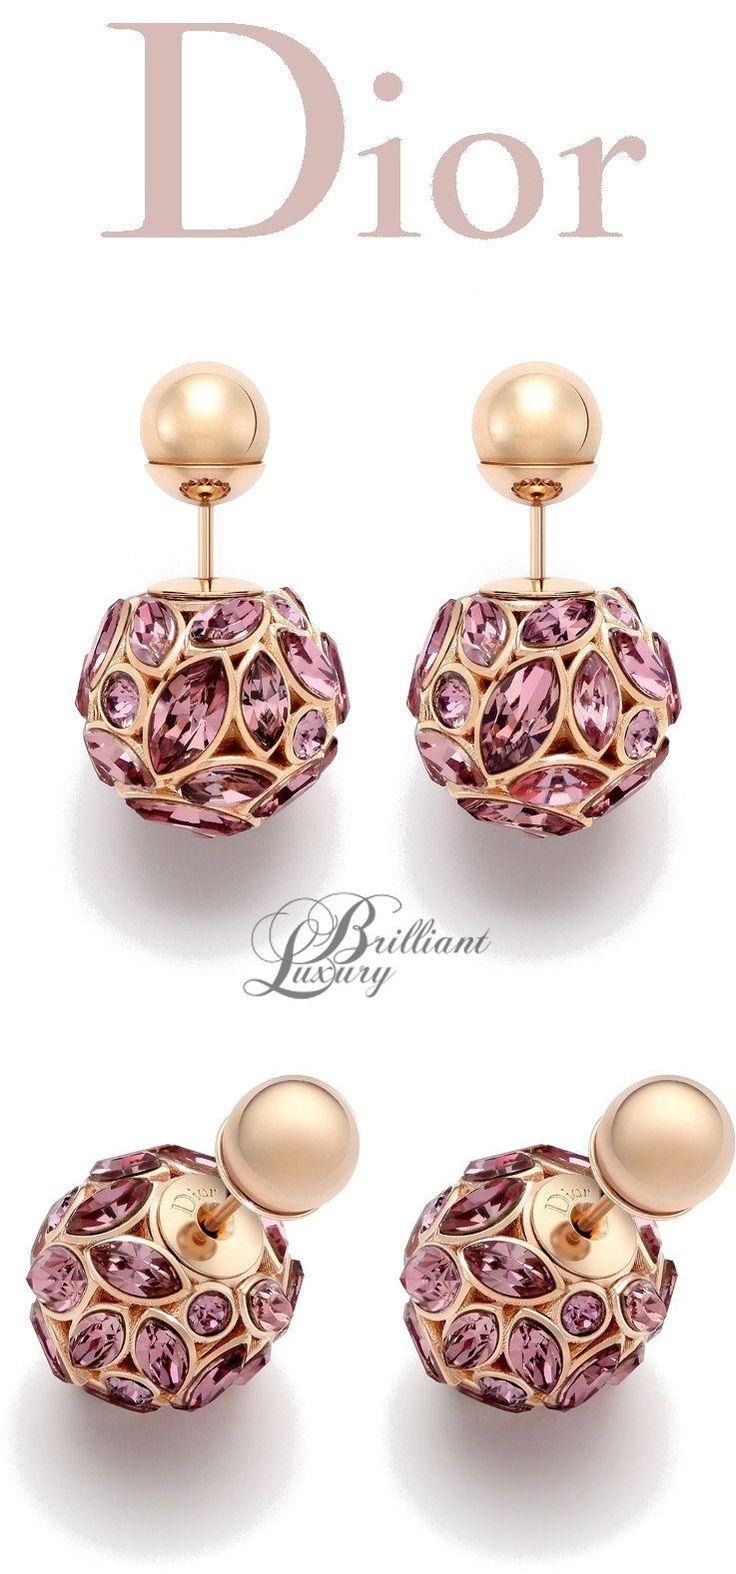 Brilliant Luxury * Dior Earrings 2015